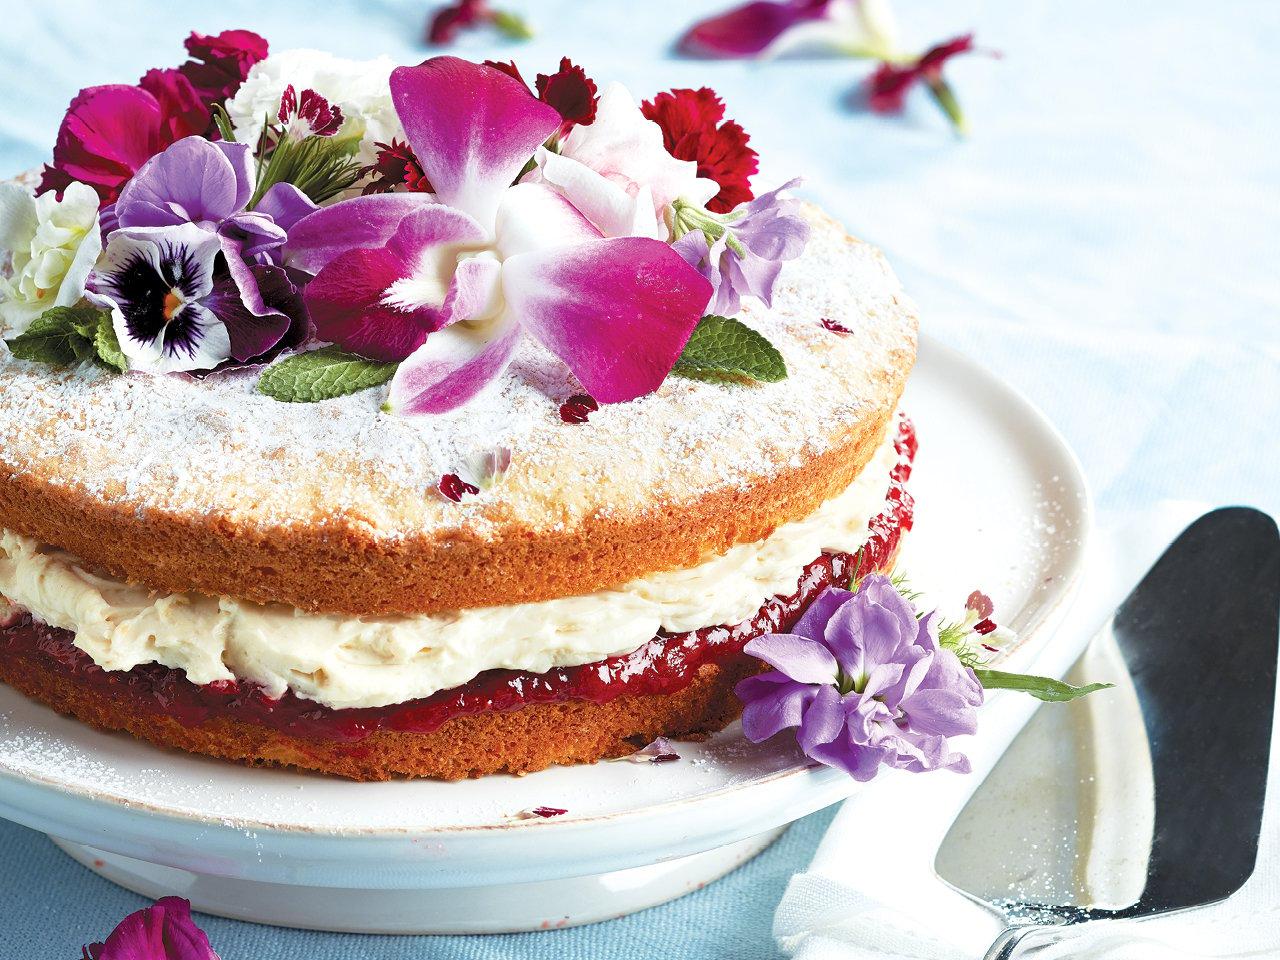 Jam And Cream Victoria Sponge Cake